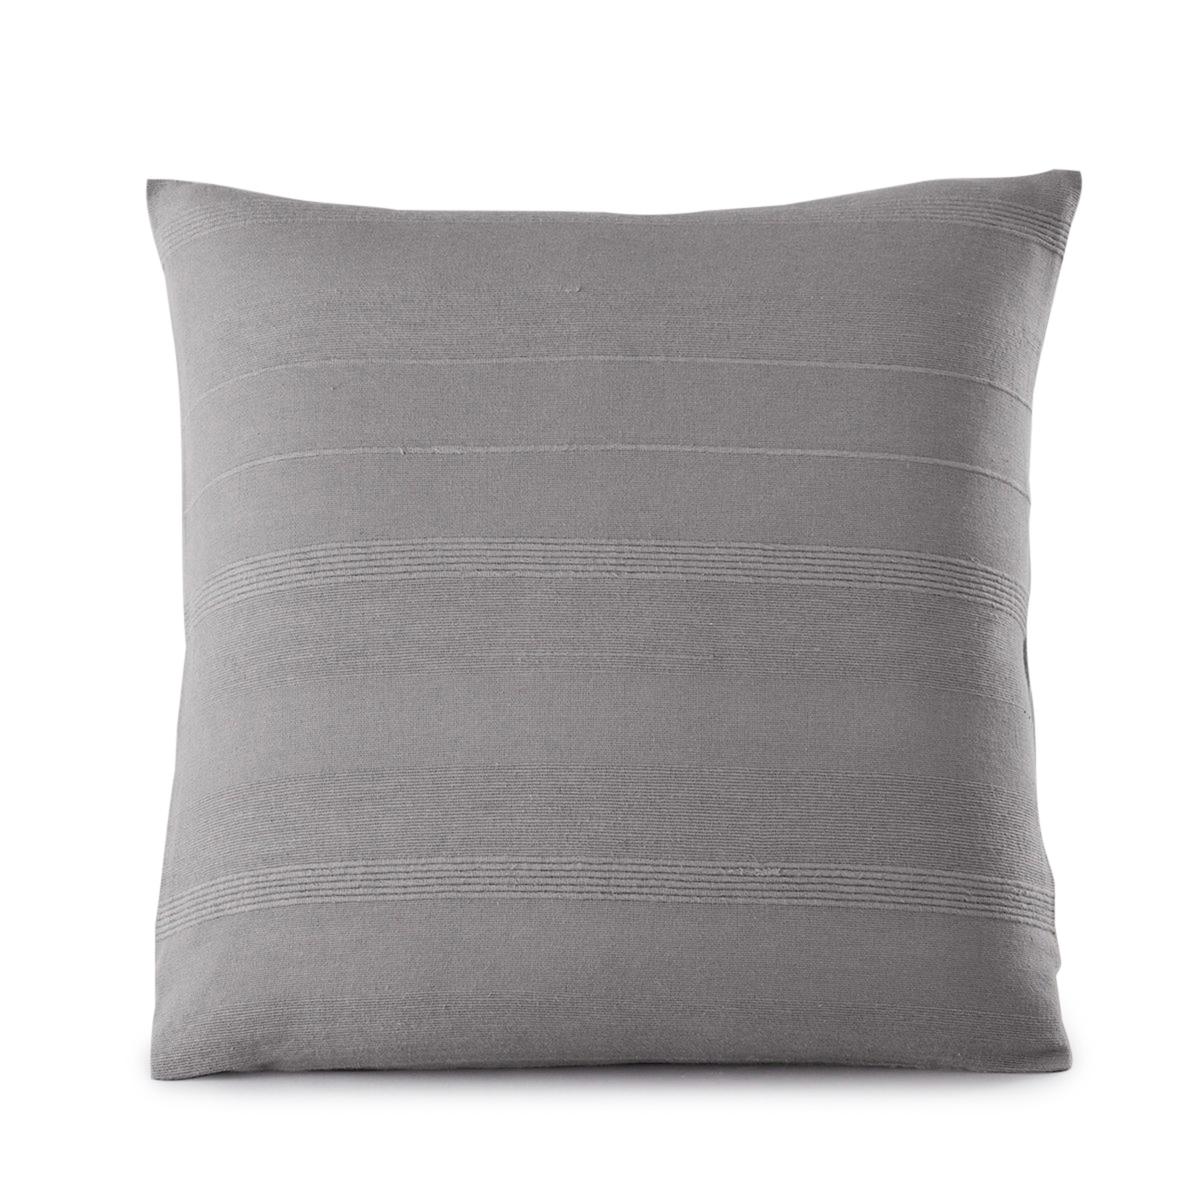 лучшая цена Наволочка La Redoute На подушку-валик или наволочка на подушку NEDO 40 x 40 см серый